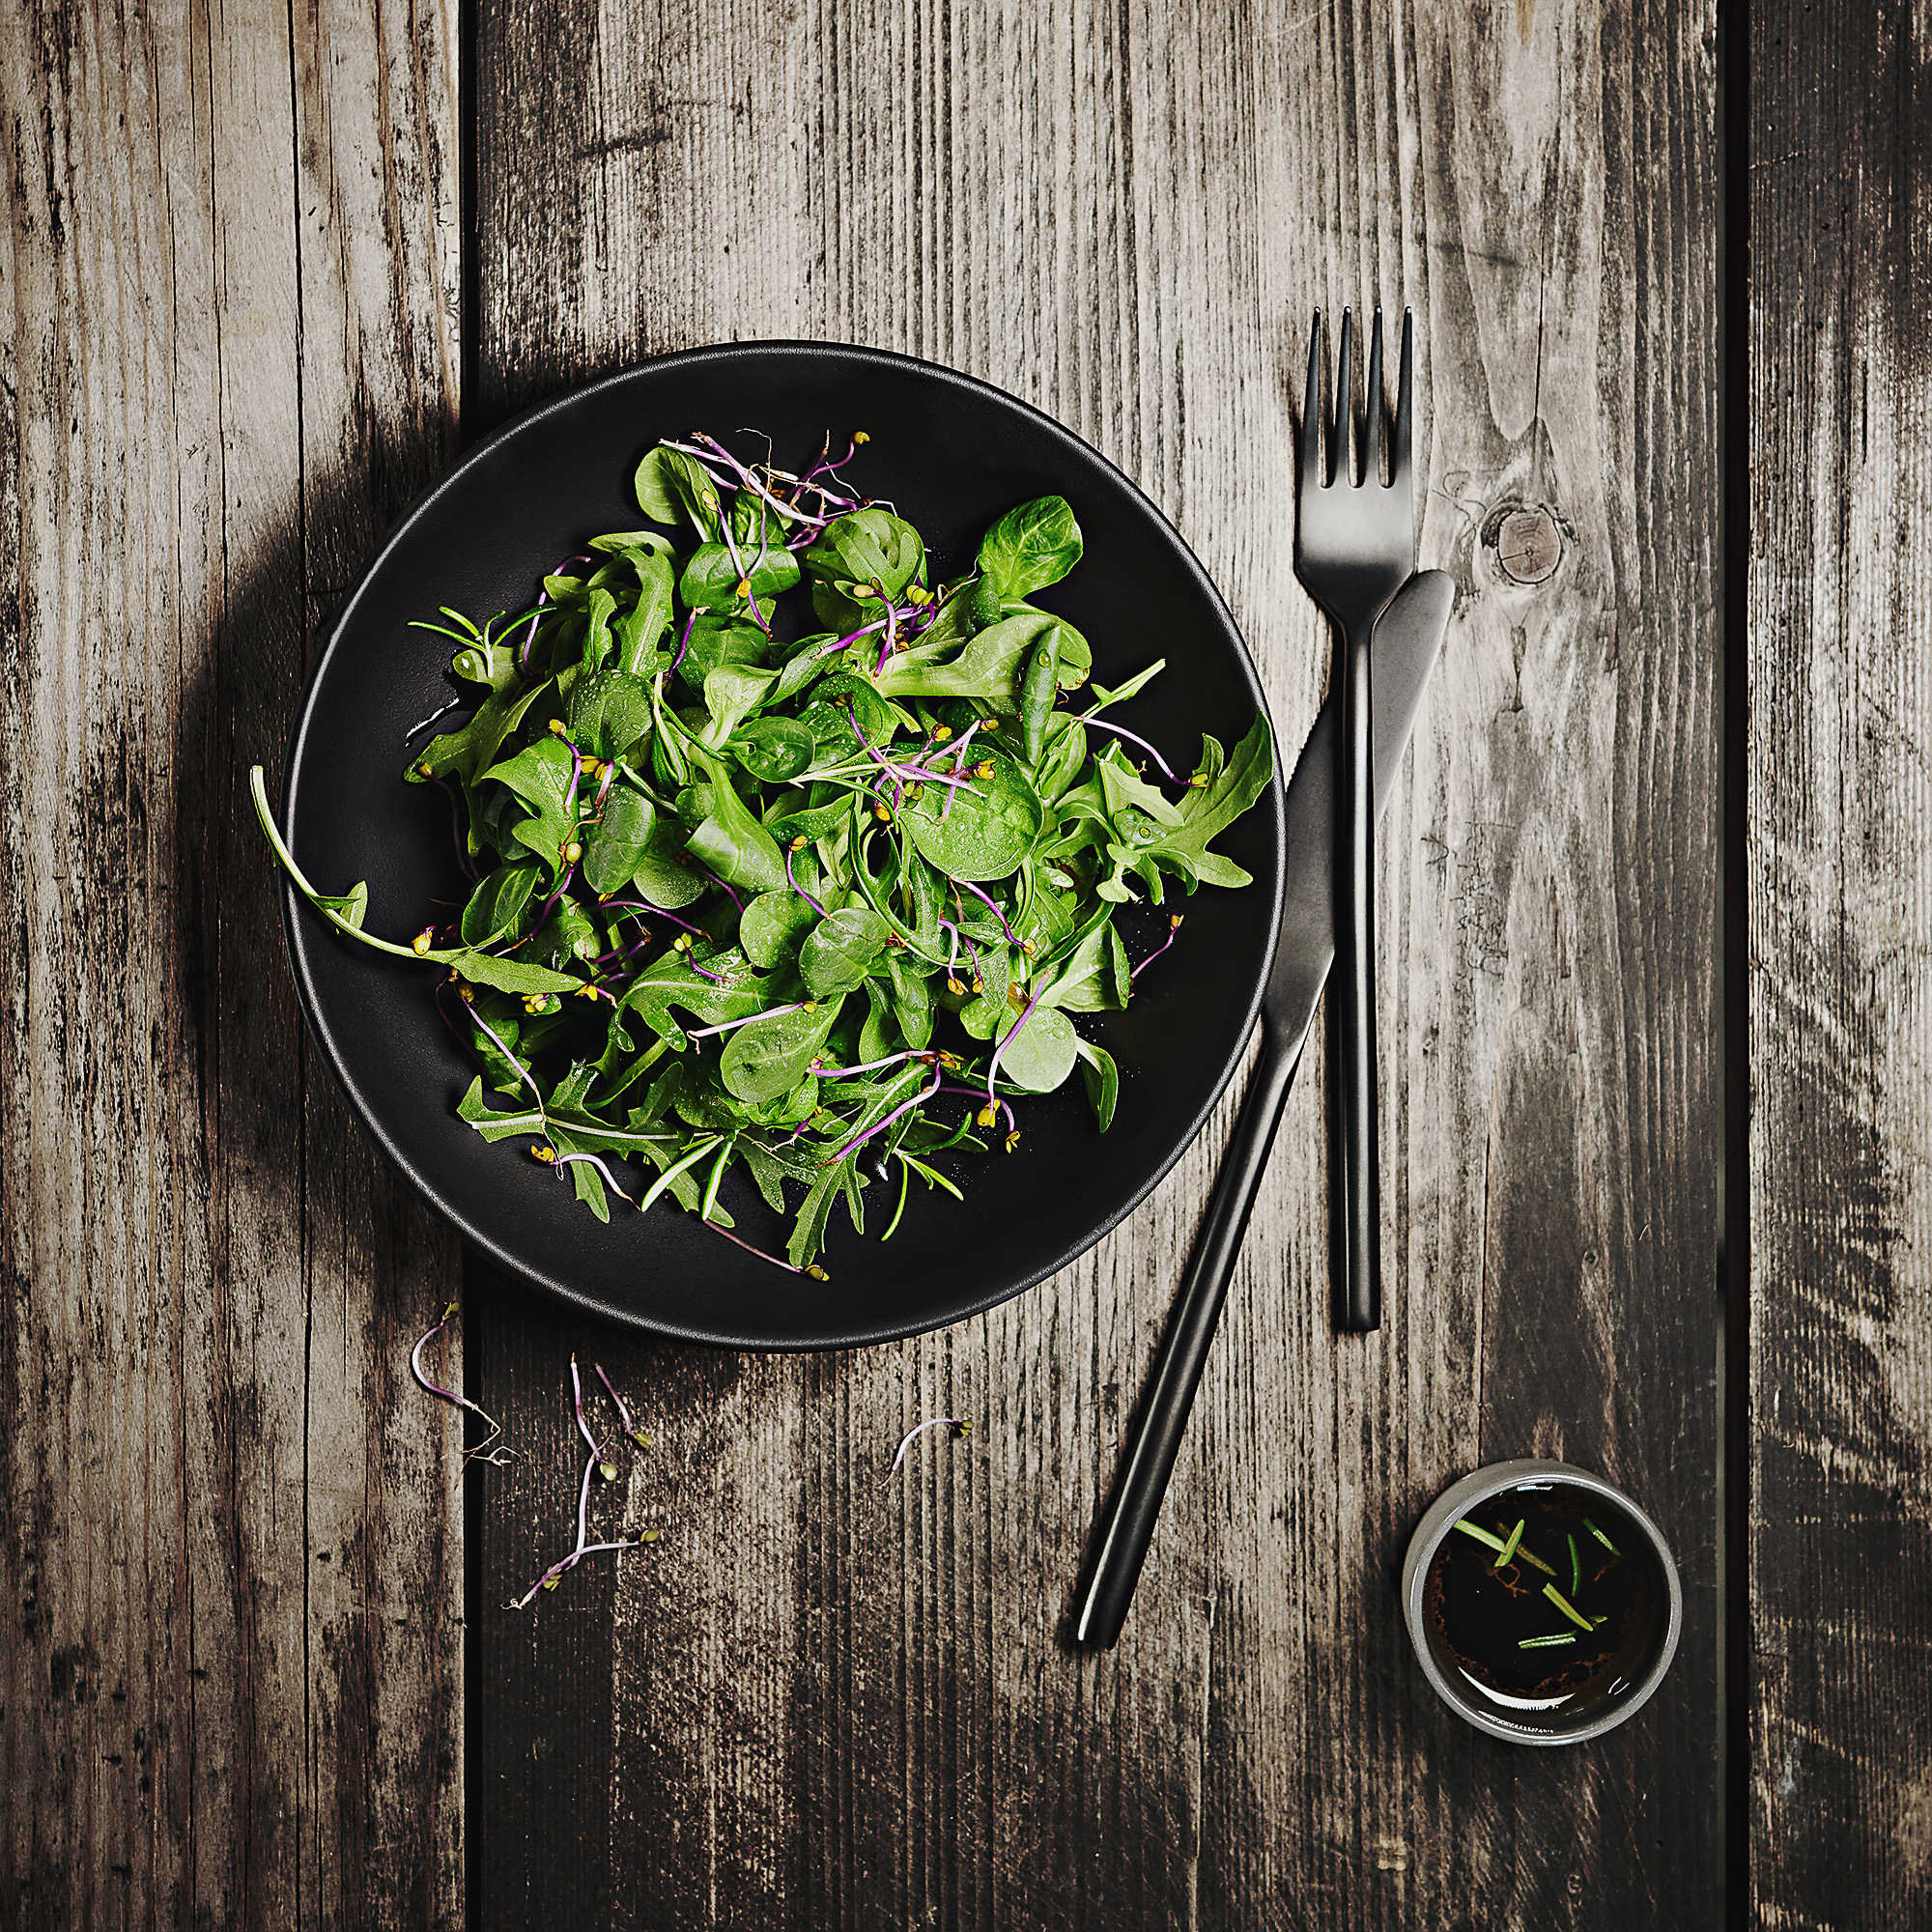 Laurent_Moynat_valerie_paumelle_agent_food_photographeculinaire_foodphotographer (29).JPG